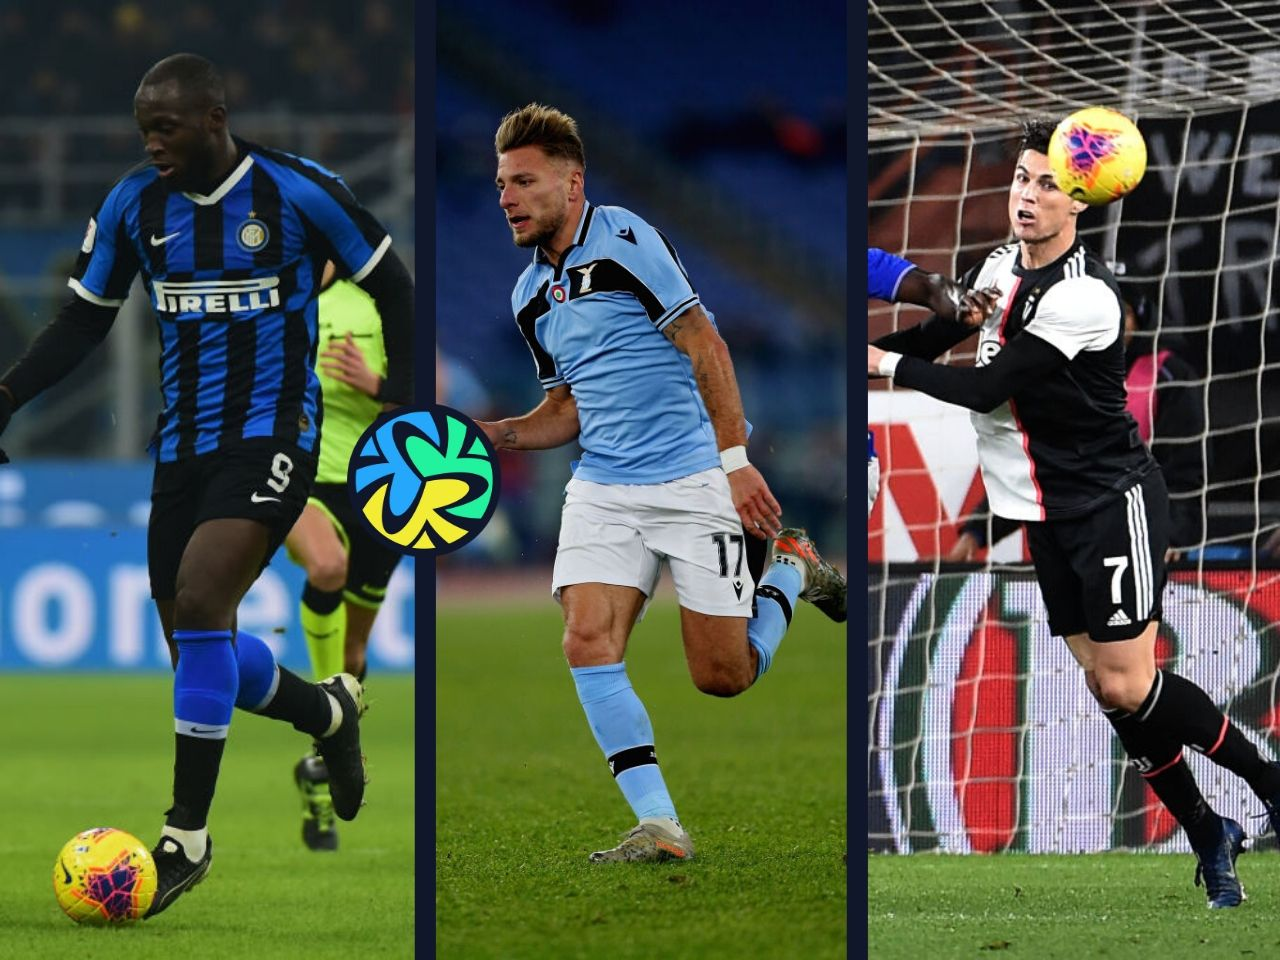 Serie A, Top 5